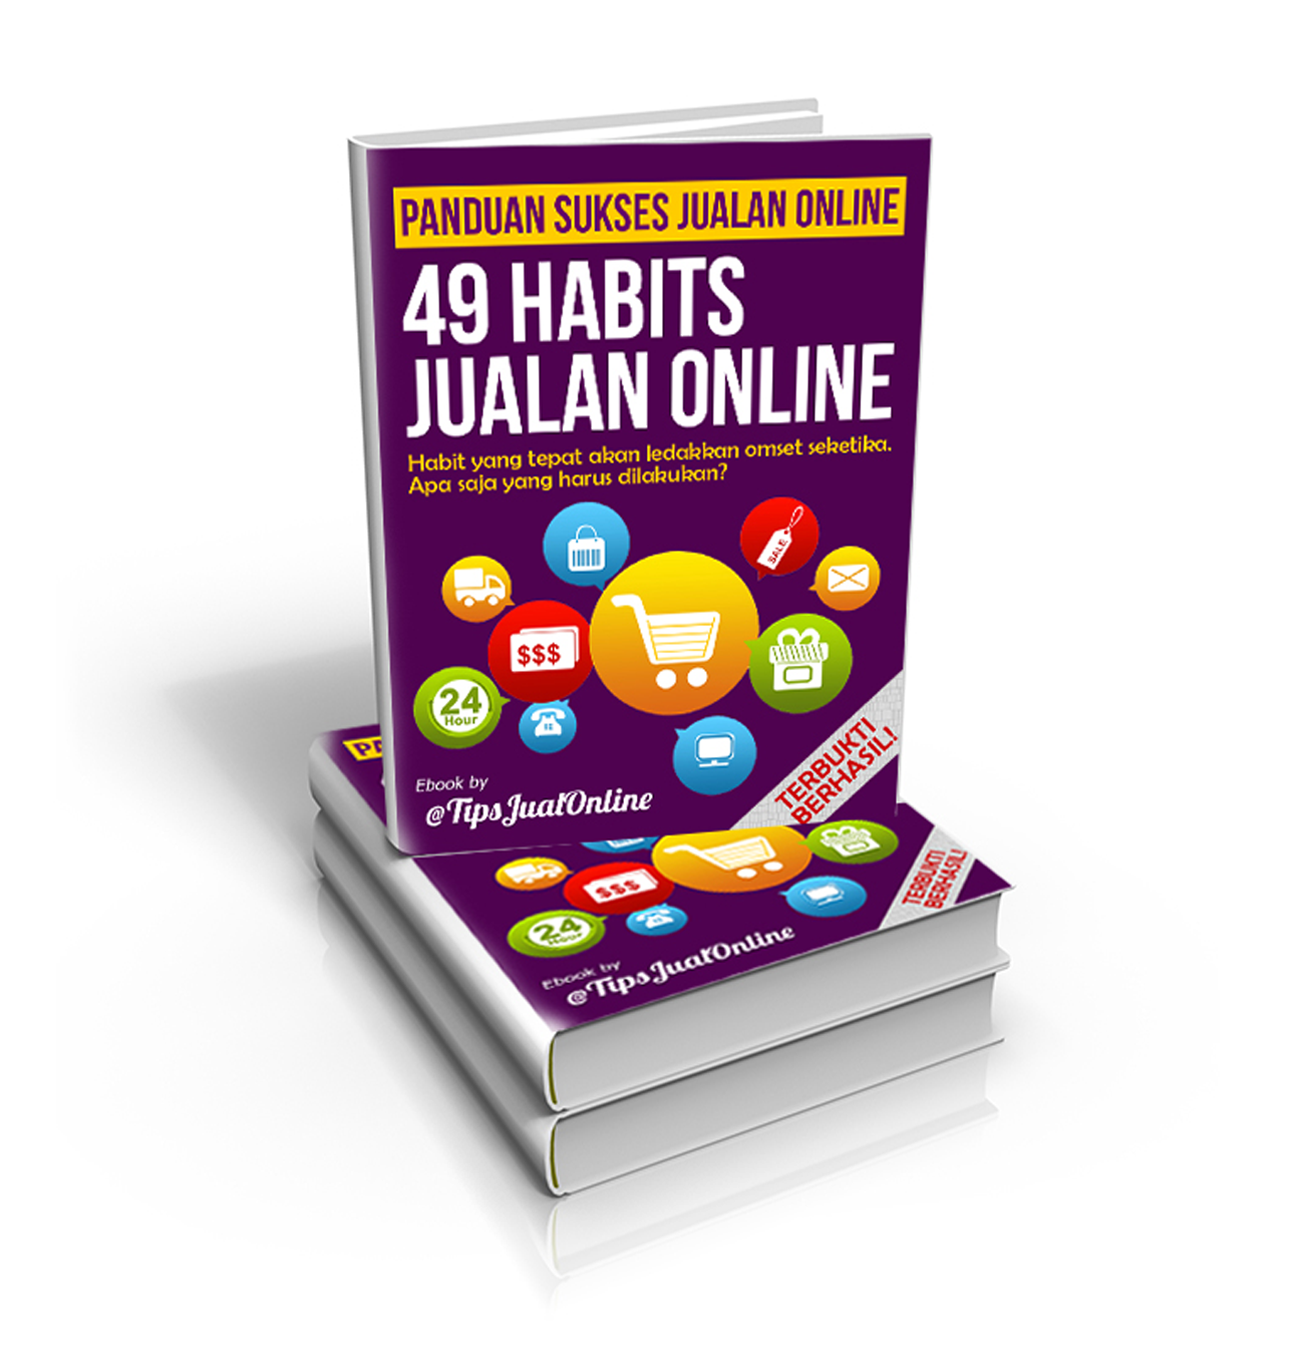 49 Resep Ampuh Untuk Penglaris Jualan Online